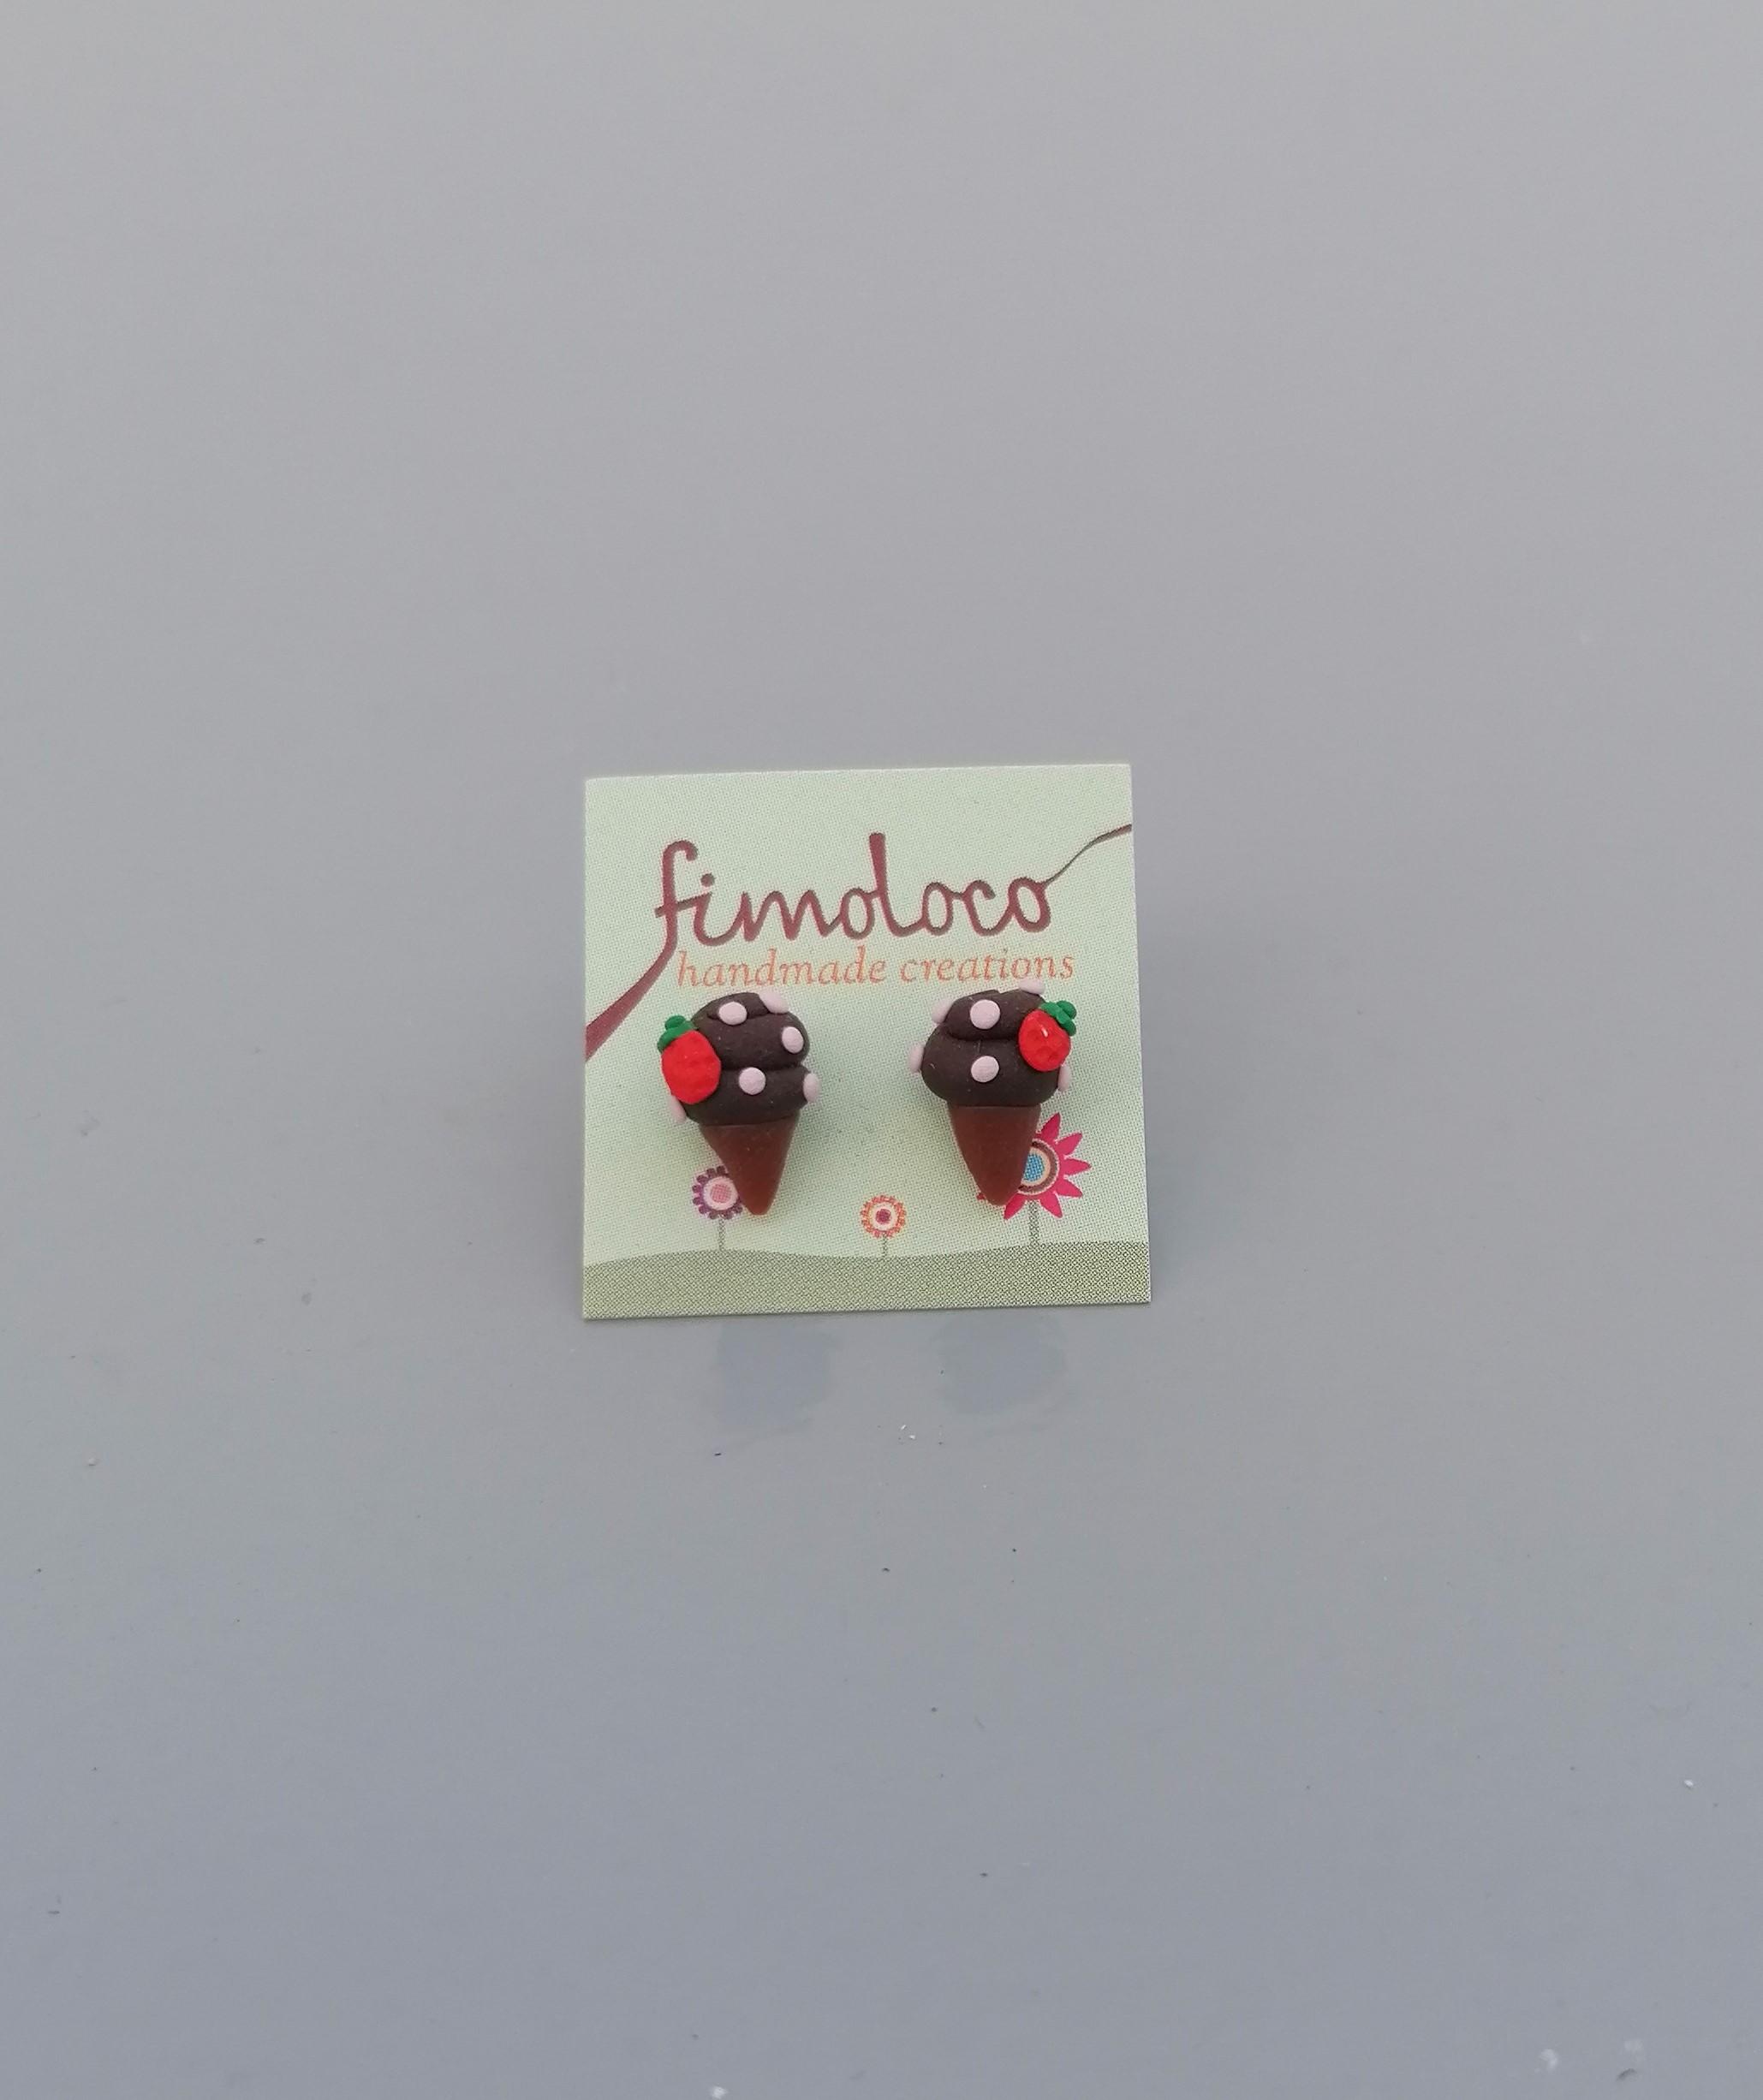 swlobeearconechokostrawberries1 1